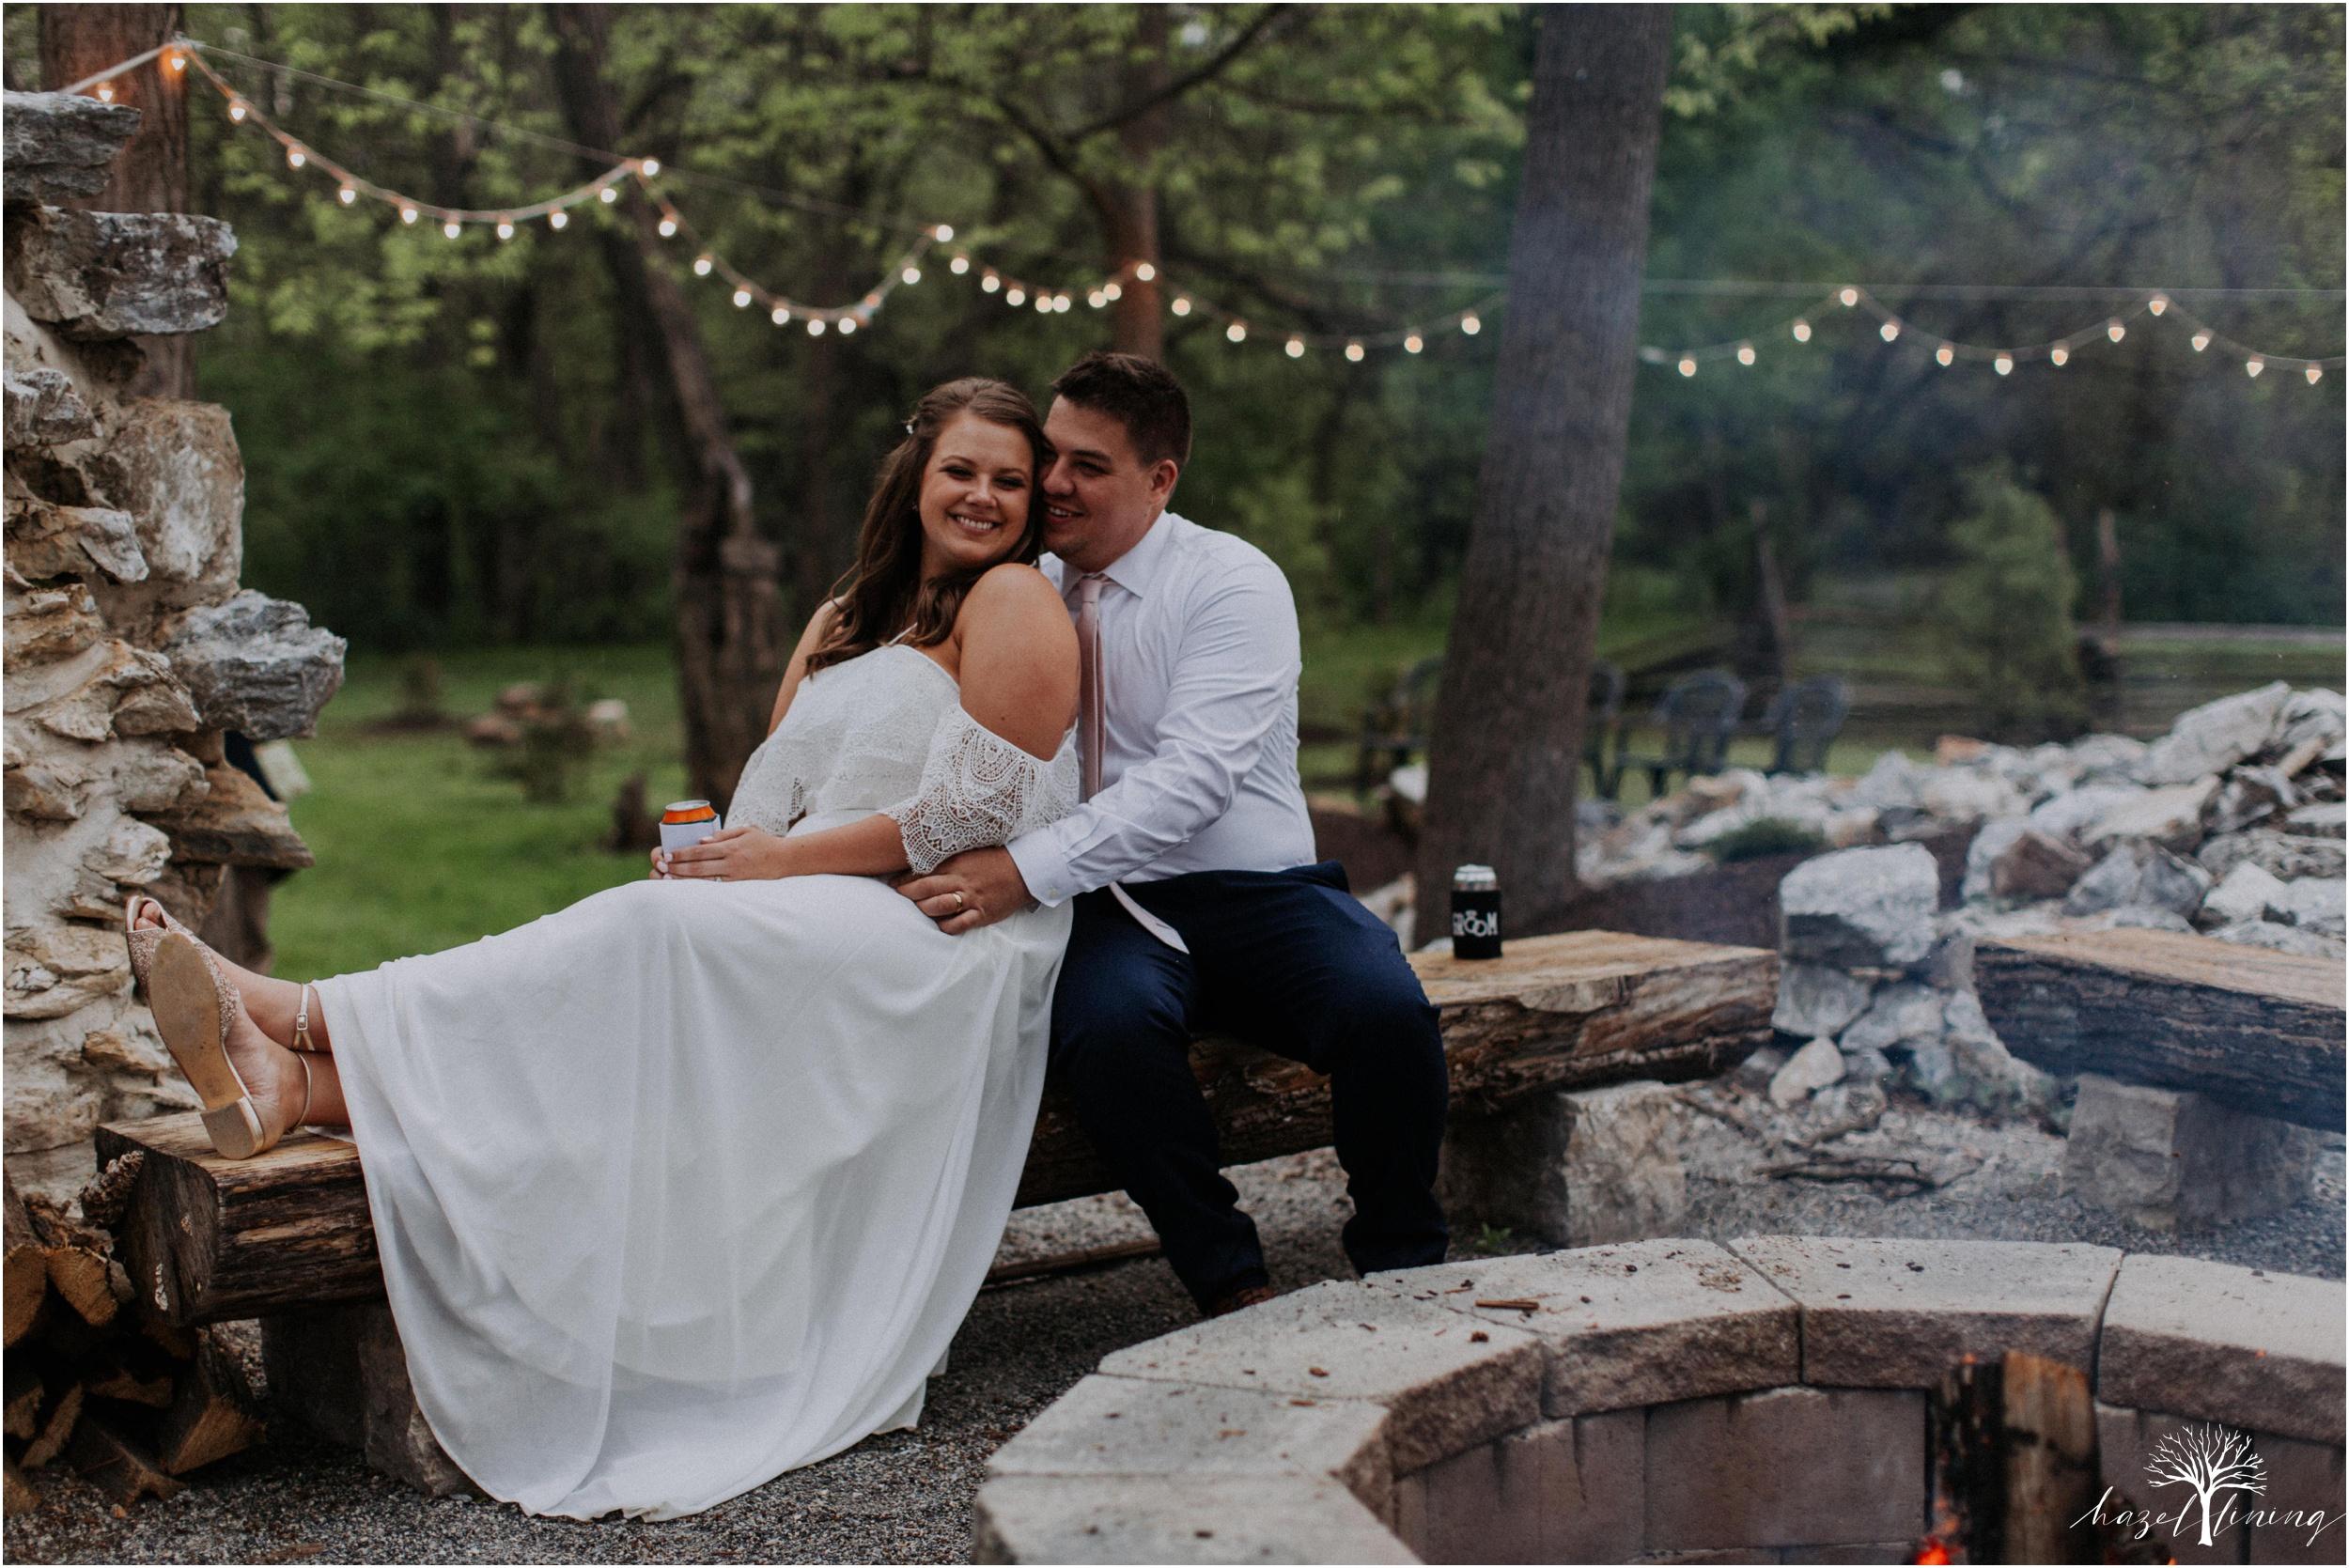 hazel-lining-travel-wedding-elopement-photography-abby-skyler-hunt-the-willis-house-york-pennsylvania-outdoor-estate-wedding_0134.jpg